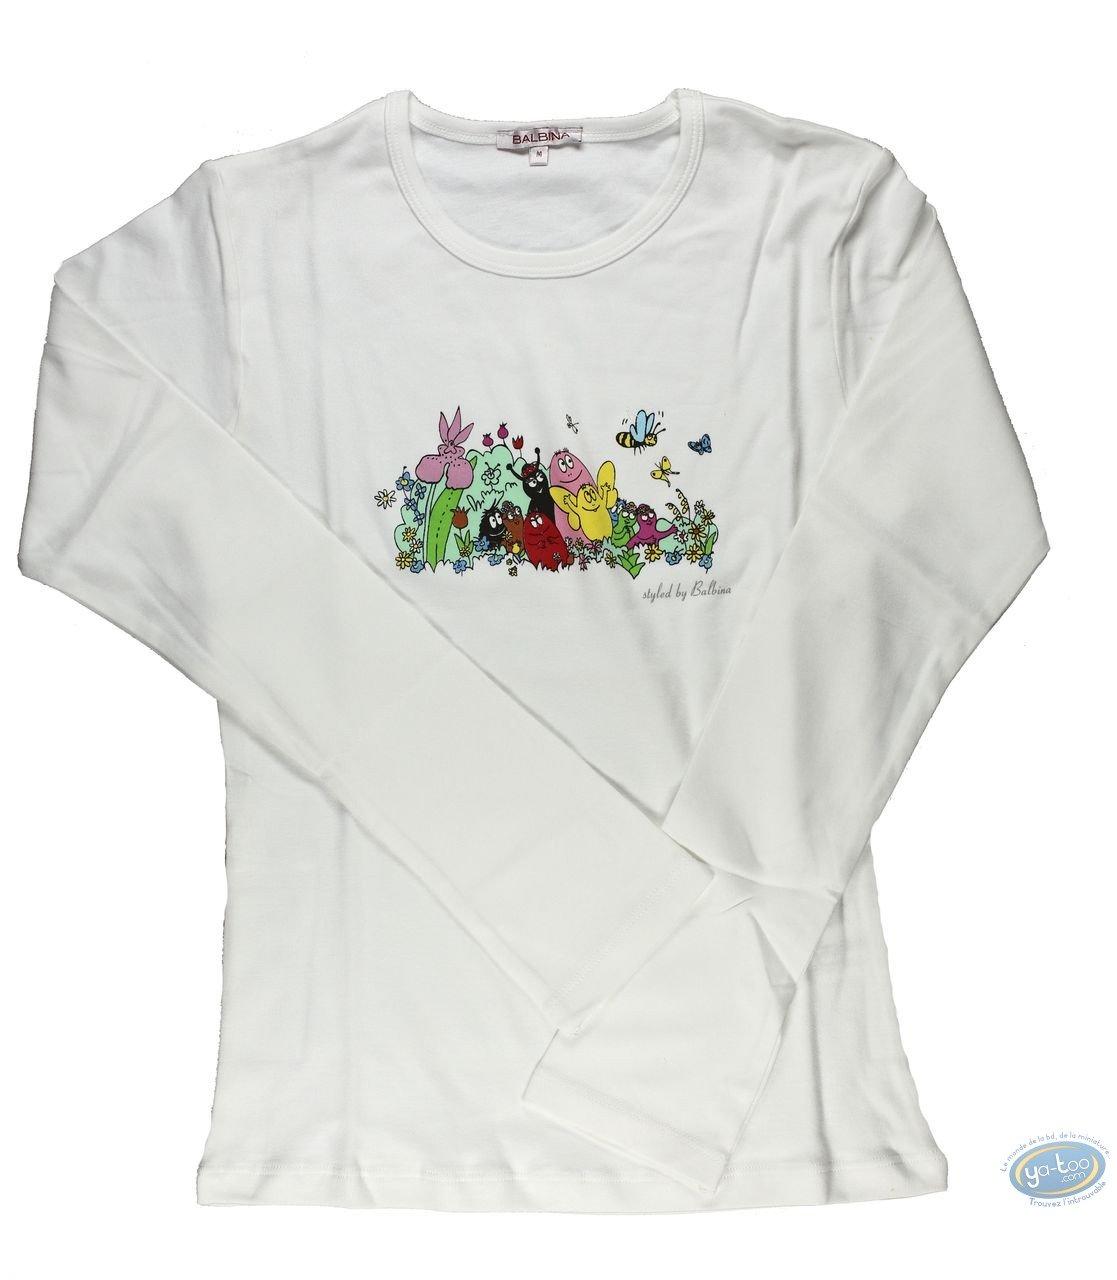 Clothes, Barbapapa : T-shirt long-sleeve white  Barbapapa: size M, family